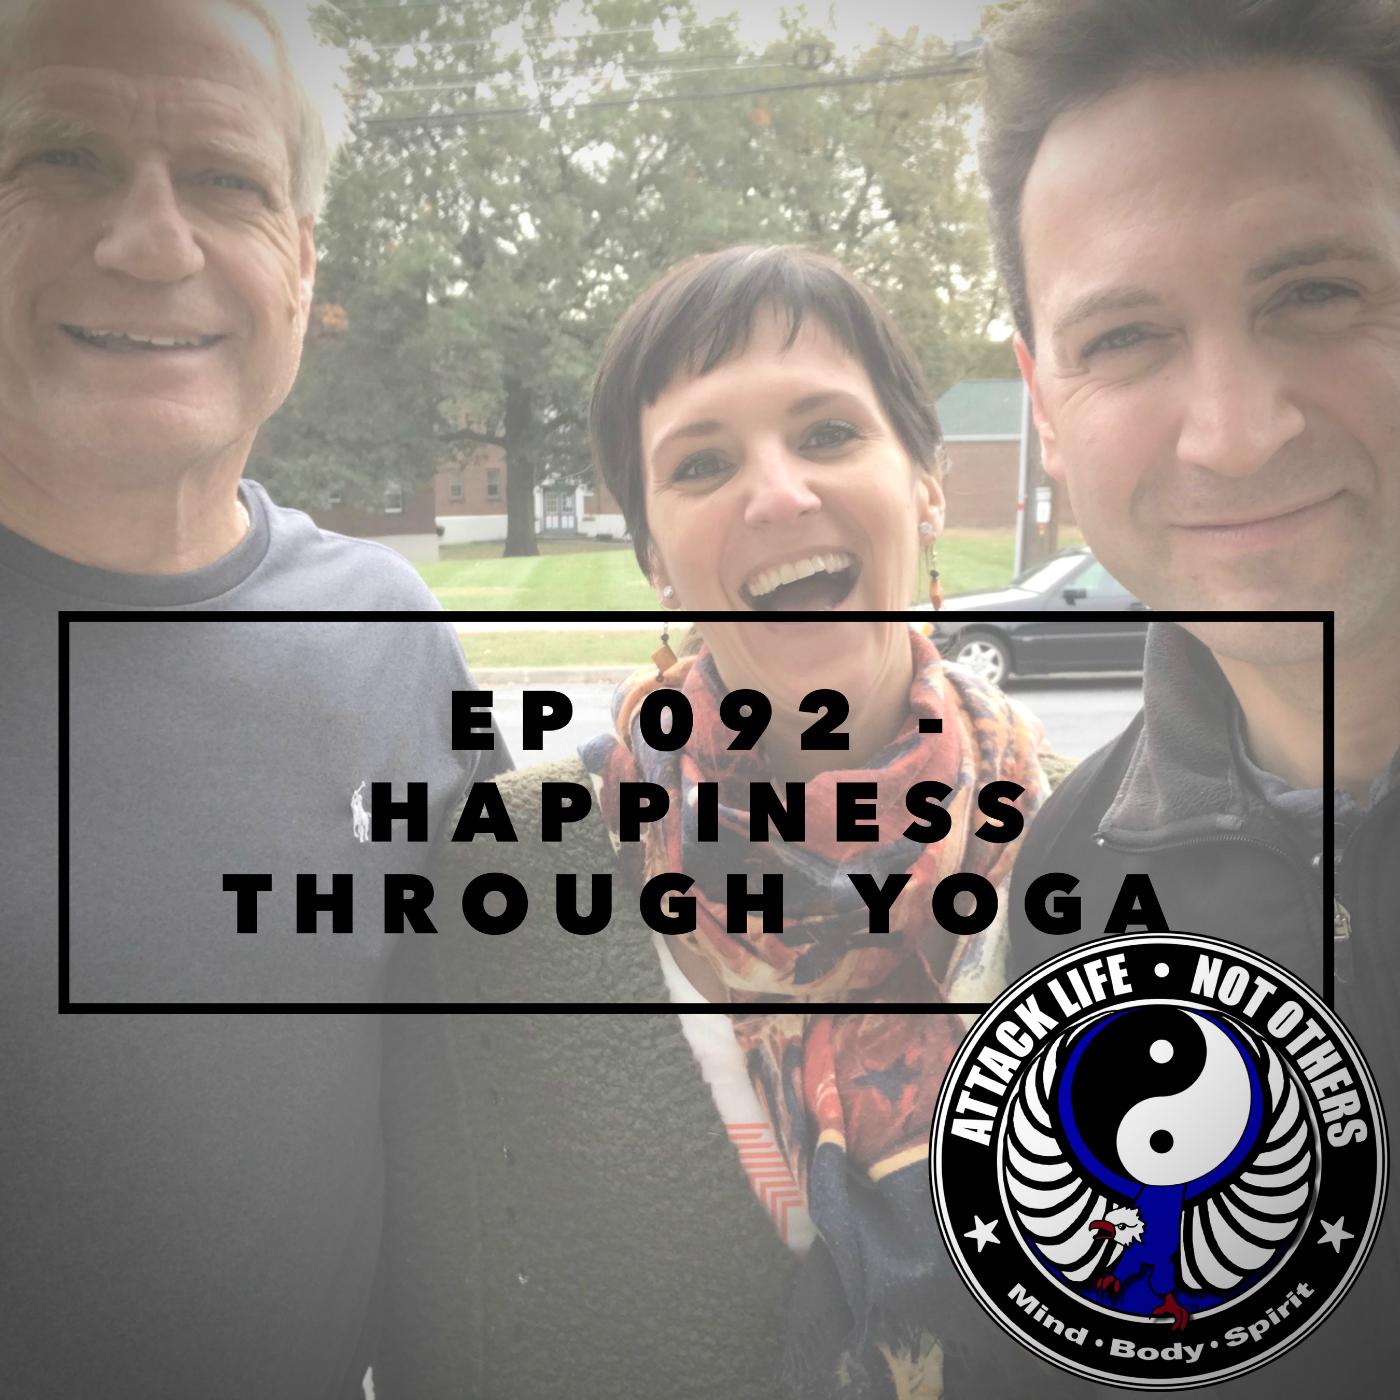 Artwork for Ep 092 - Happiness Through Yoga